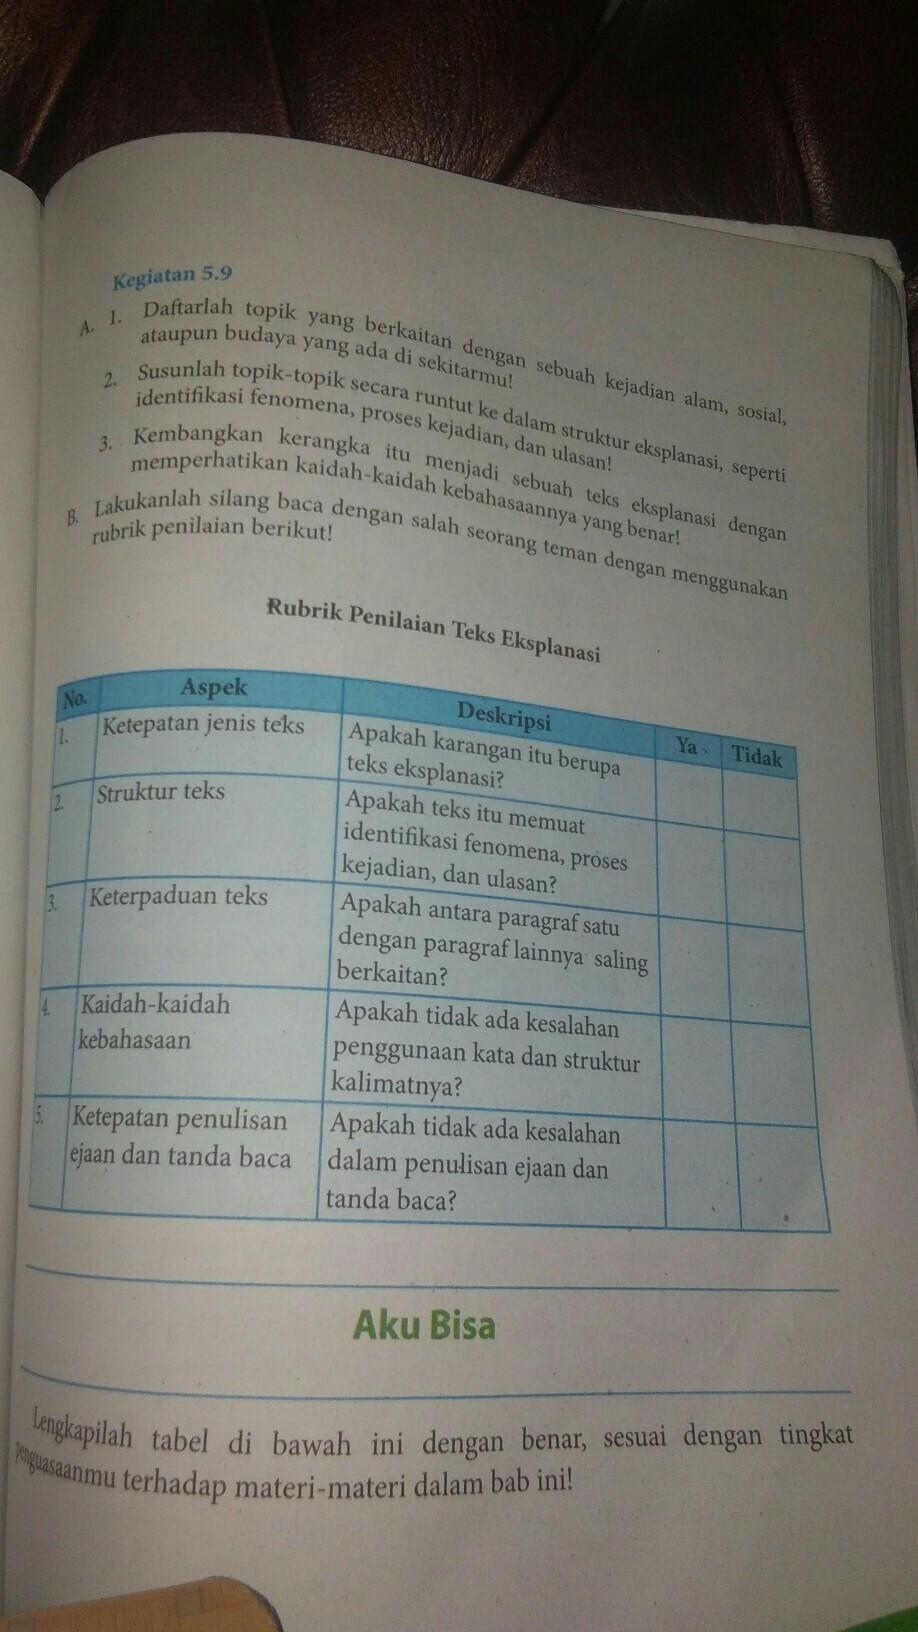 Kunci jawaban buku bahasa indonesia kelas 9 halaman 13. Jawaban Seni Budaya Kelas 9 Halaman 155 Cara Golden